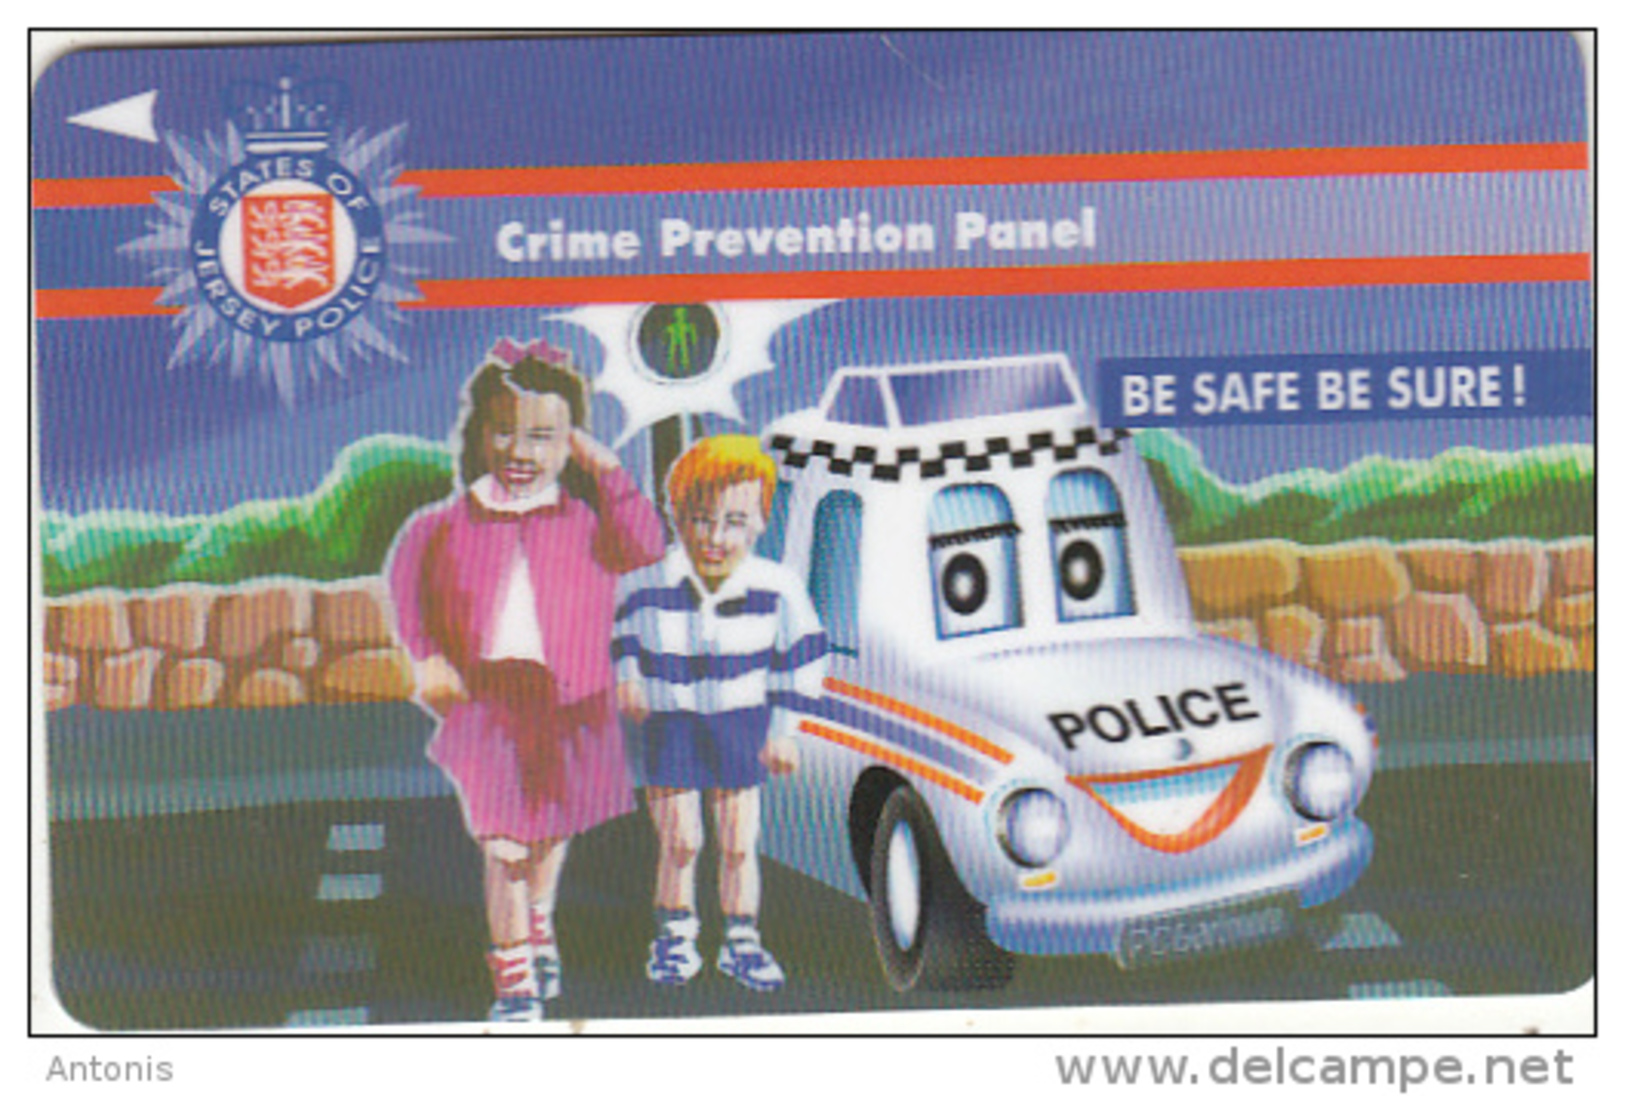 JERSEY ISL.(GPT) - Police/Crime Prevention Panel, CN : 41JERA(normal 0), Tirage %19300, Used - United Kingdom